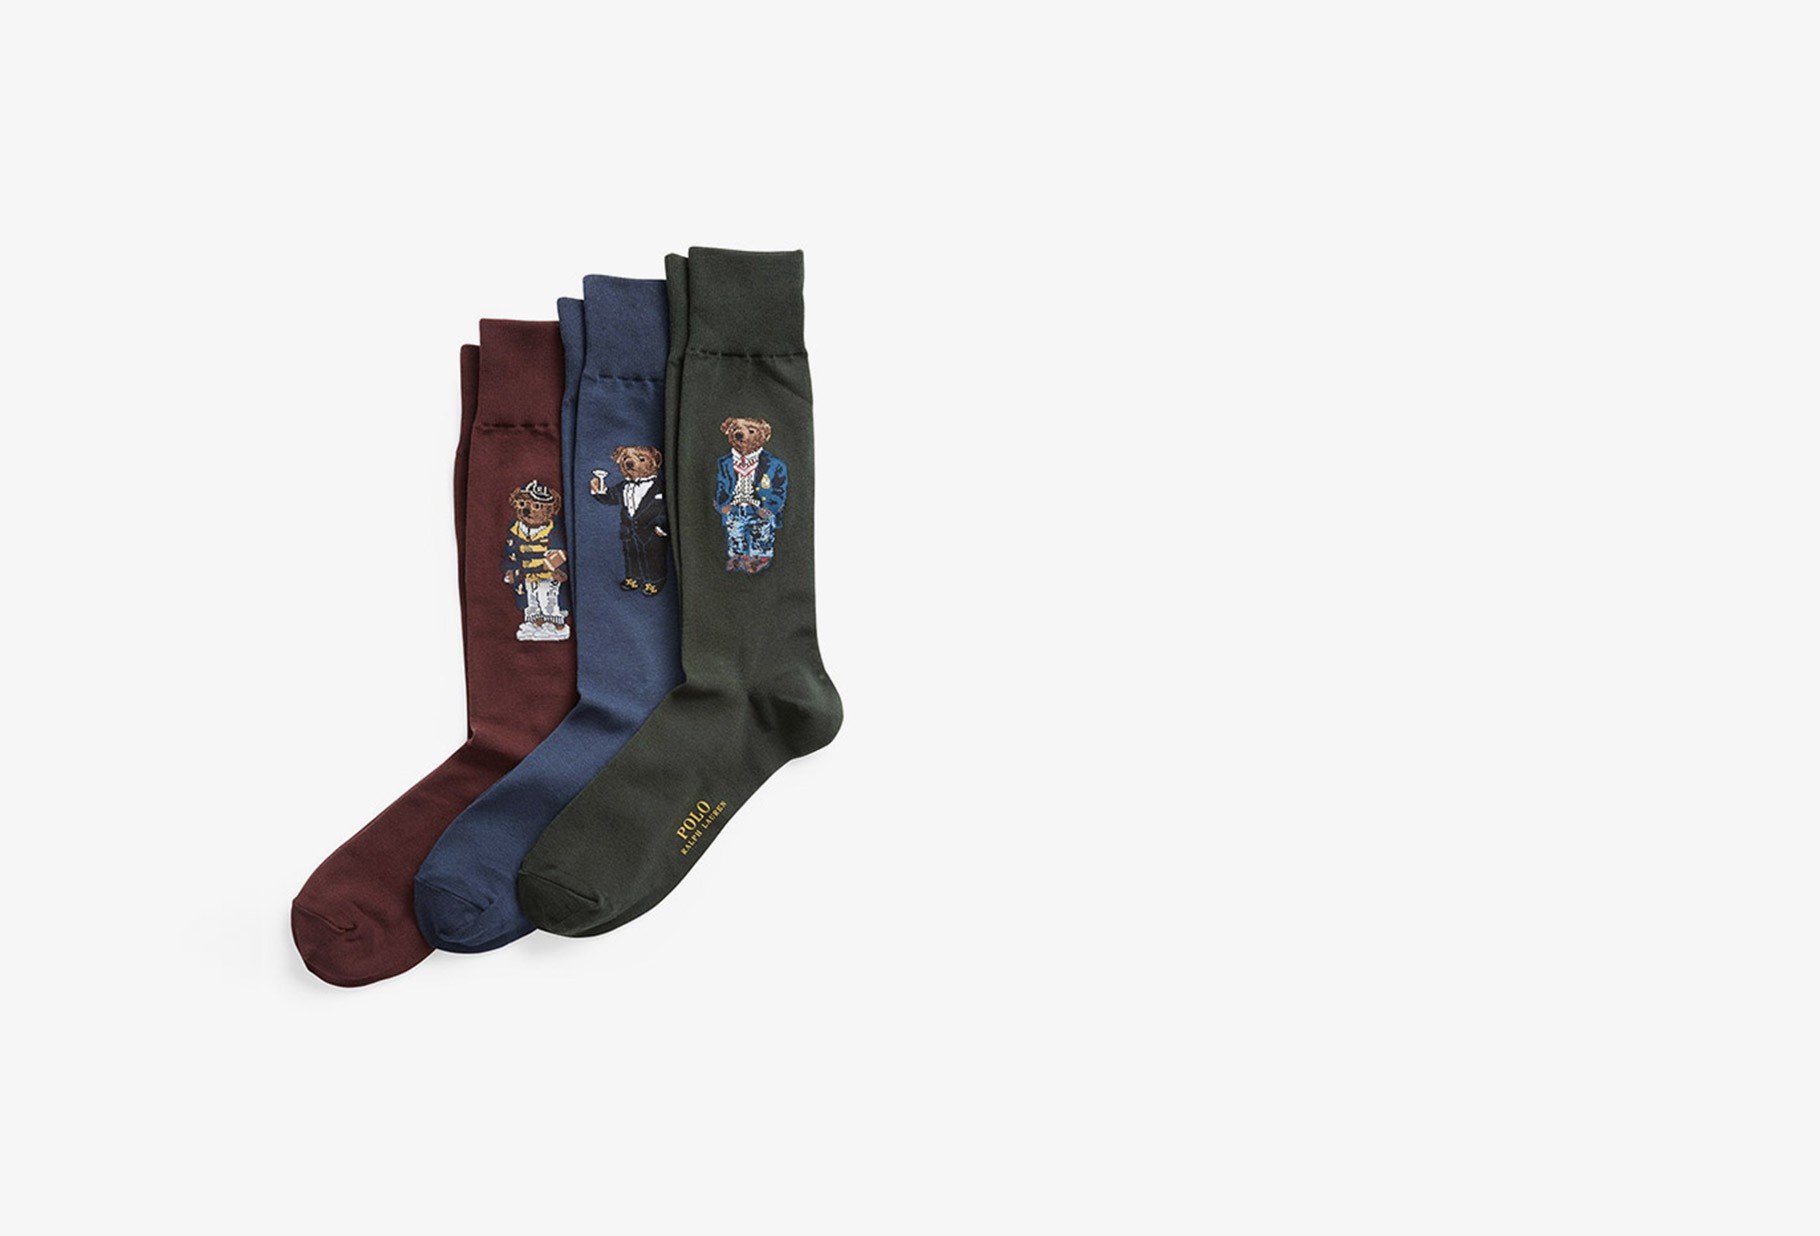 POLO RALPH LAUREN / Gift box socks teddy bear Multi